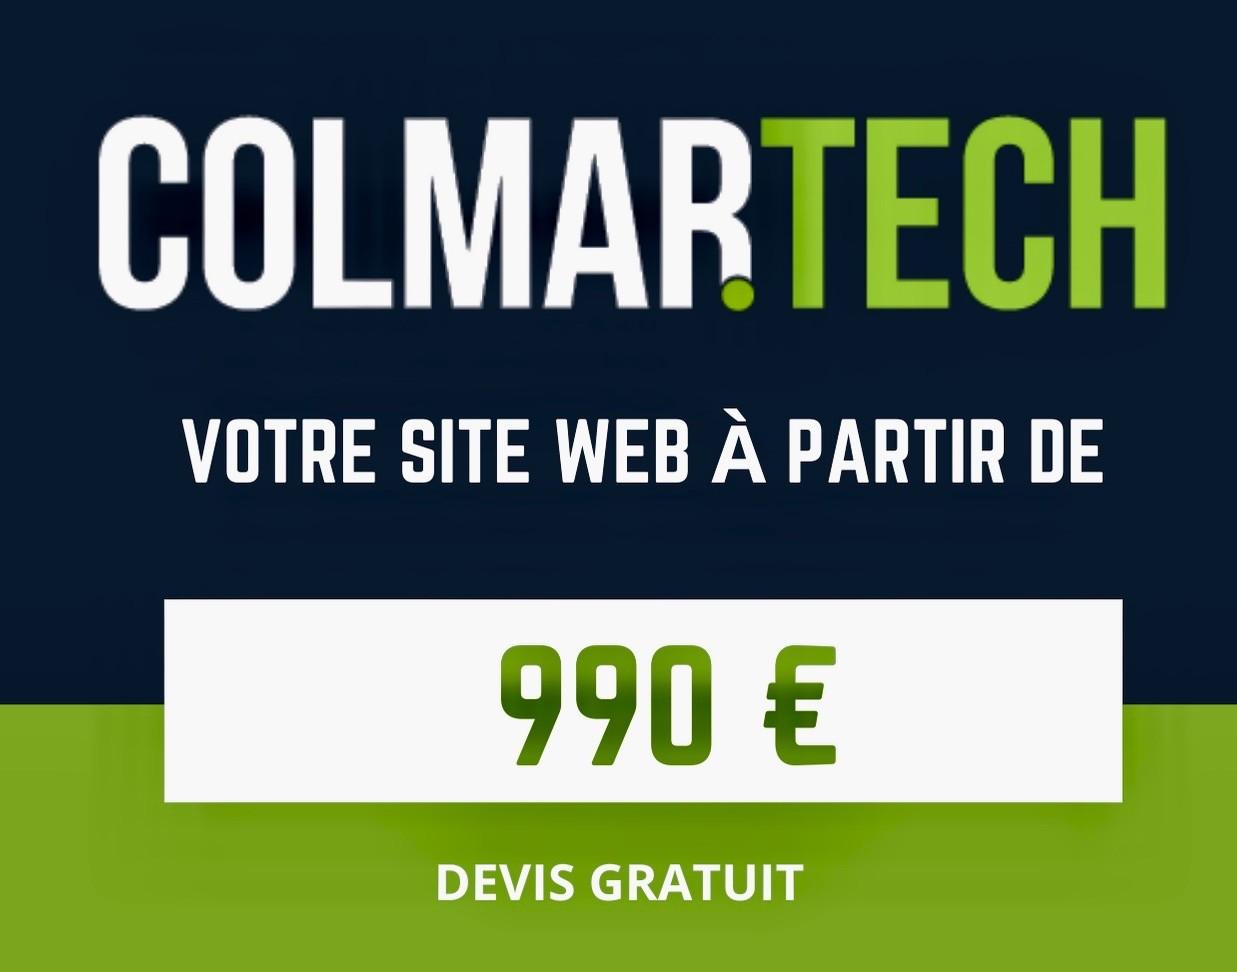 Agence Colmar